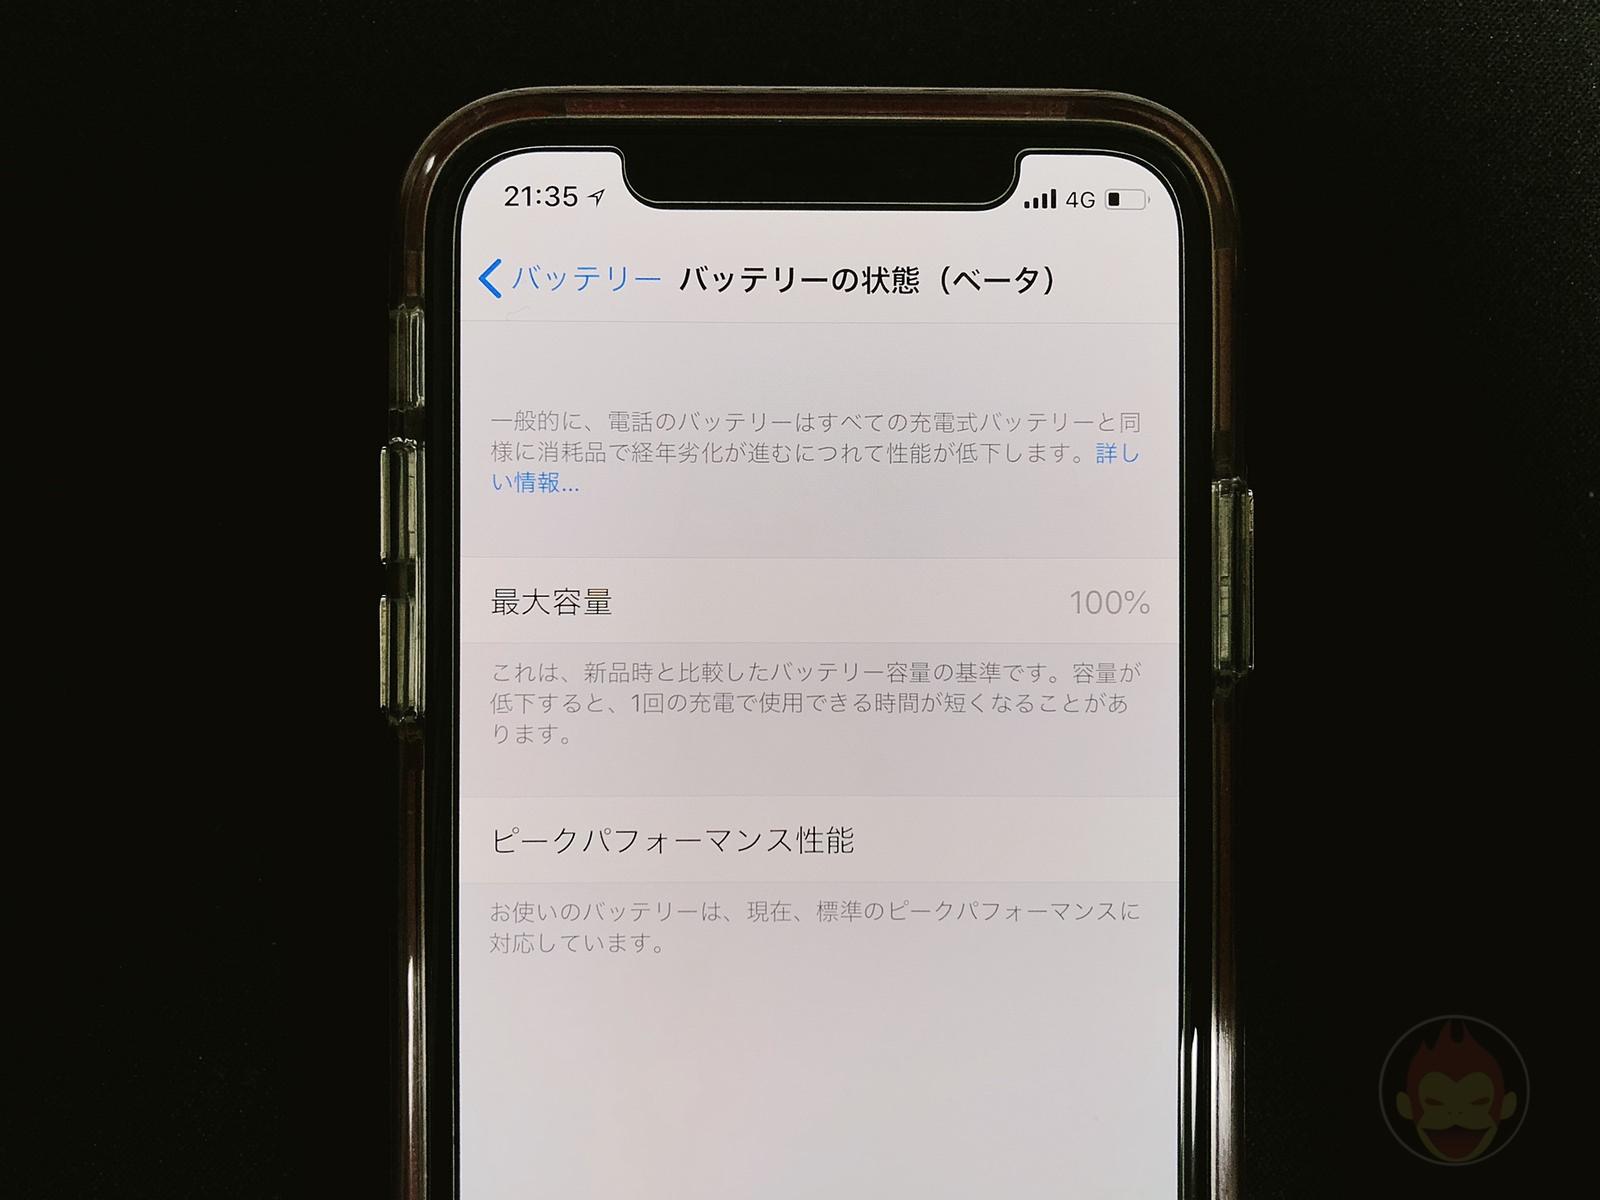 iphone-battery-charge-maximum-01.jpg